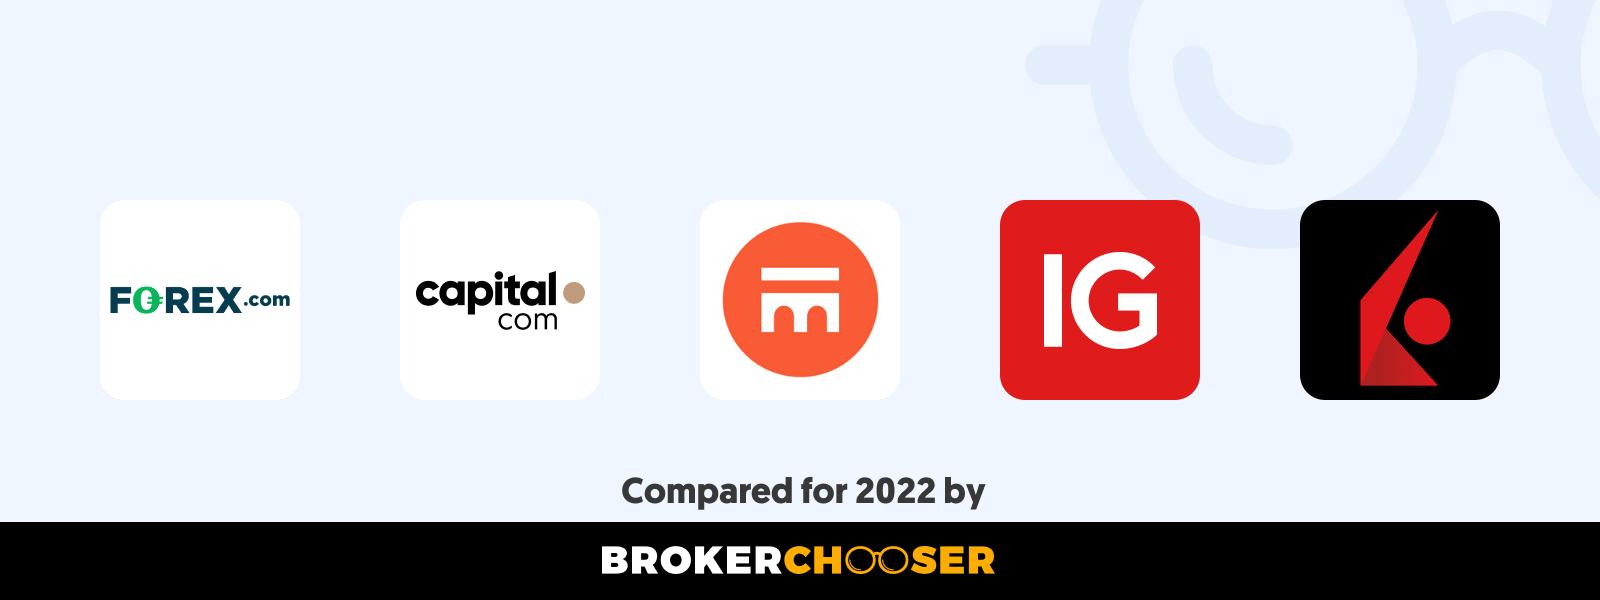 Best forex brokers for beginners in Guatemala in 2021